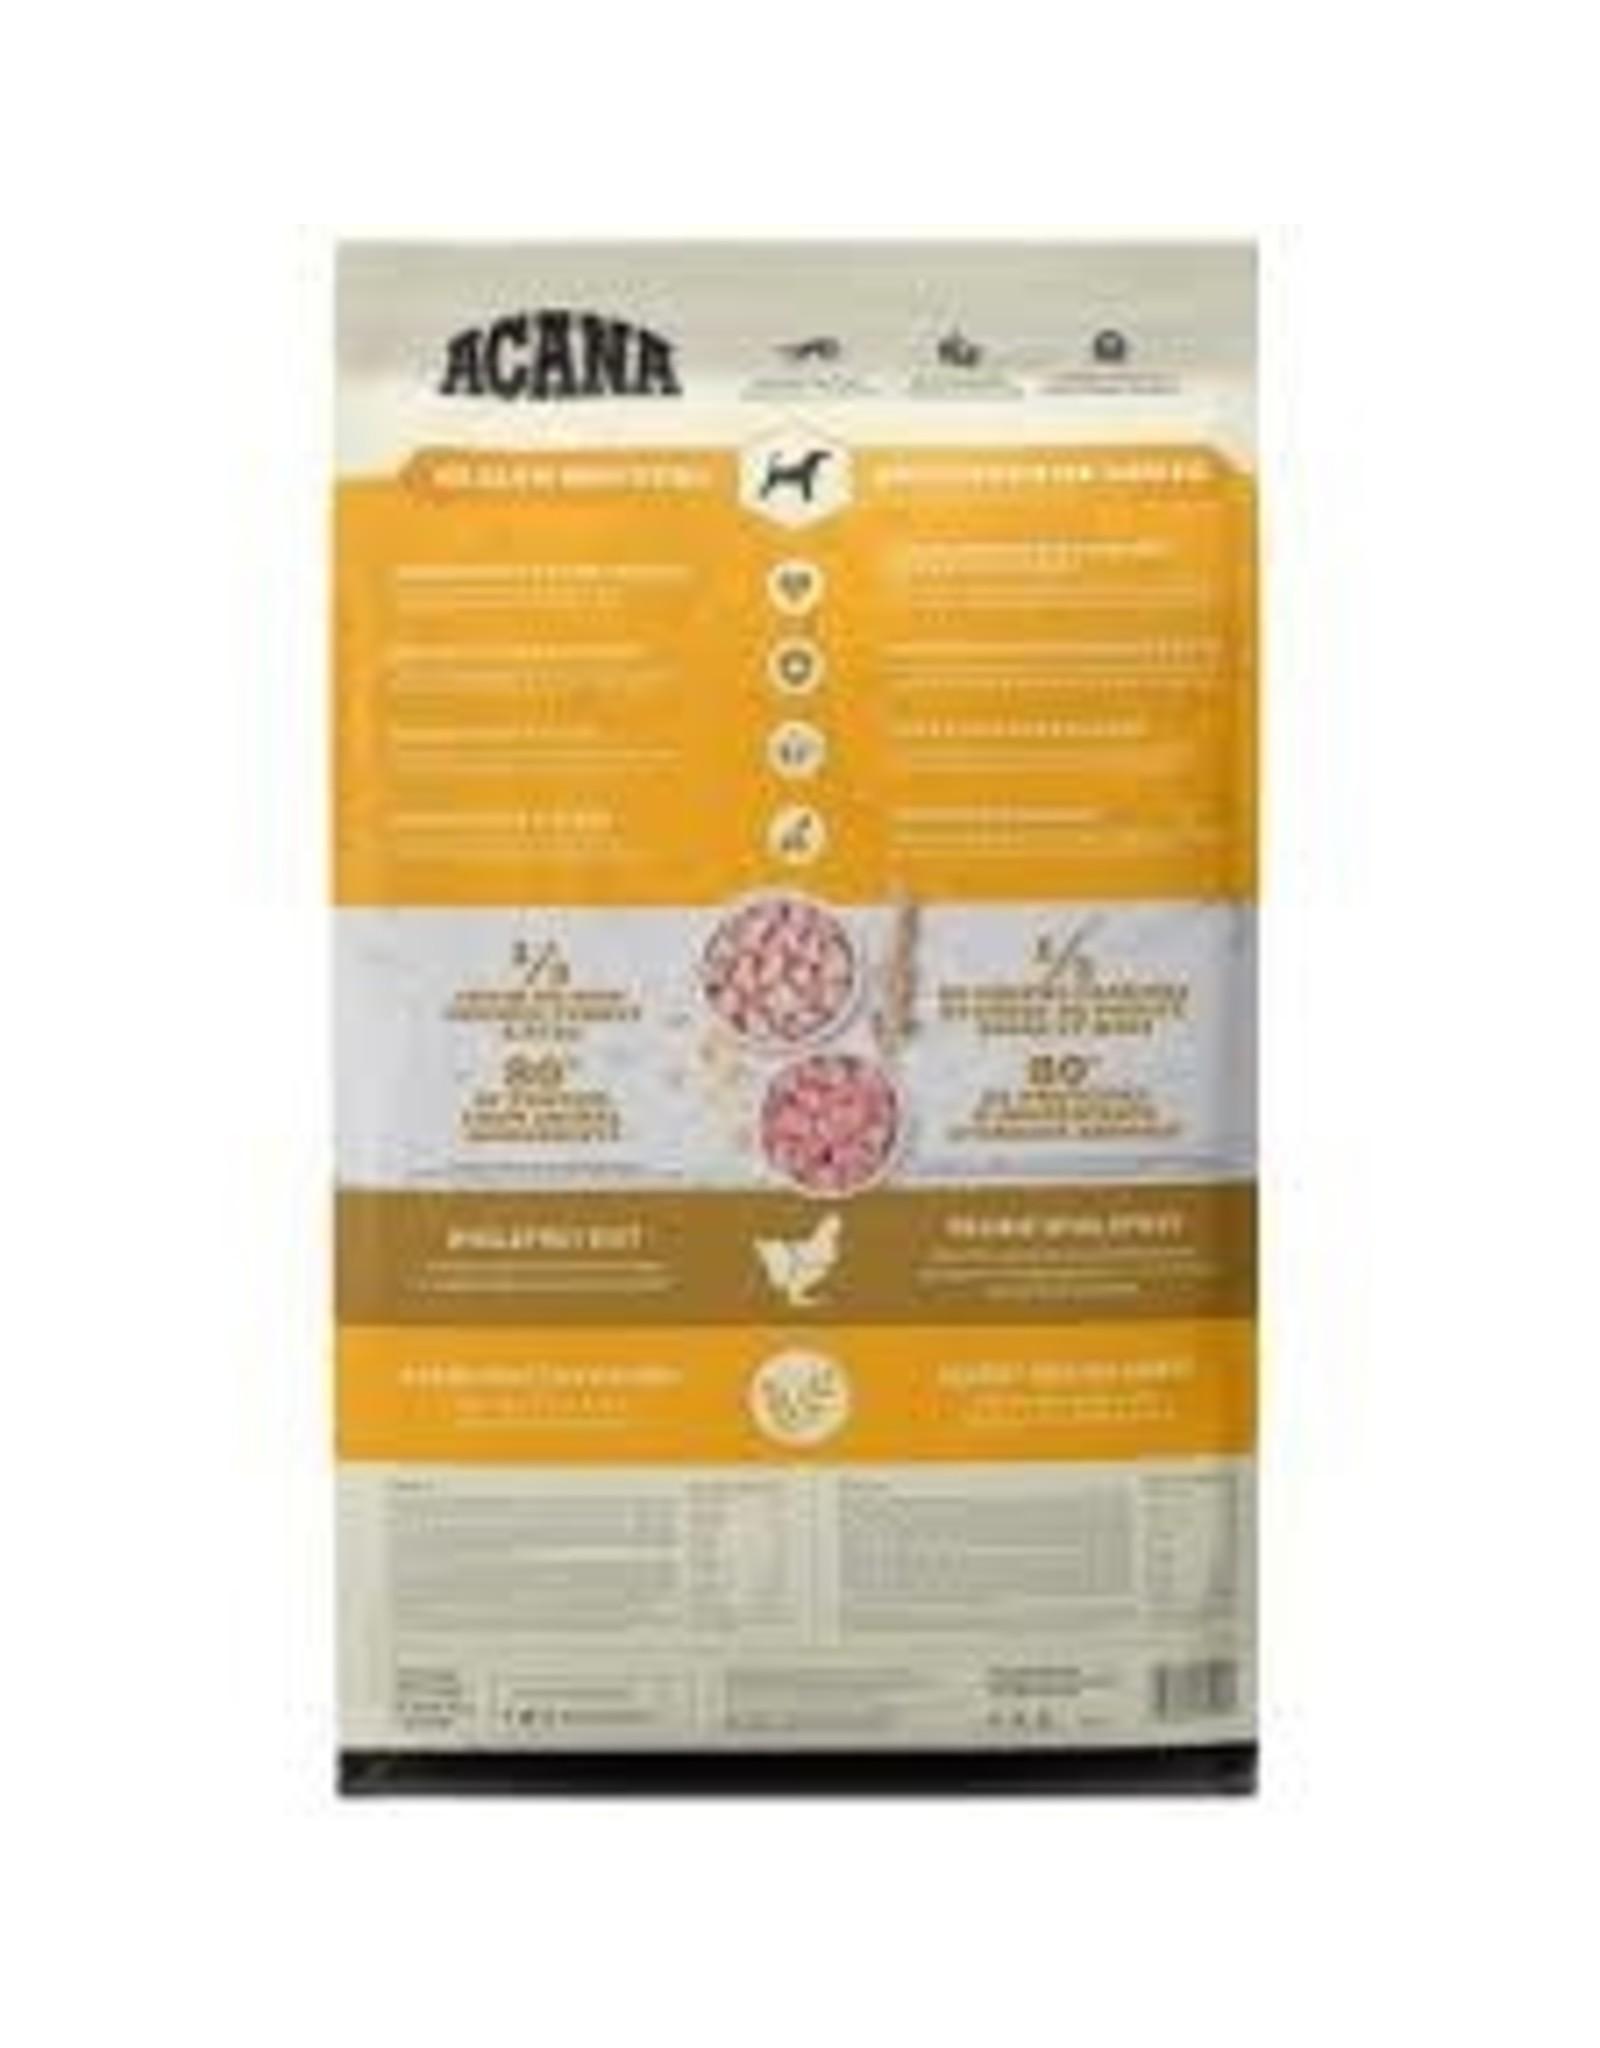 ACANA ACANA HealthyGrains - Free-Run Poultry 10.2kg